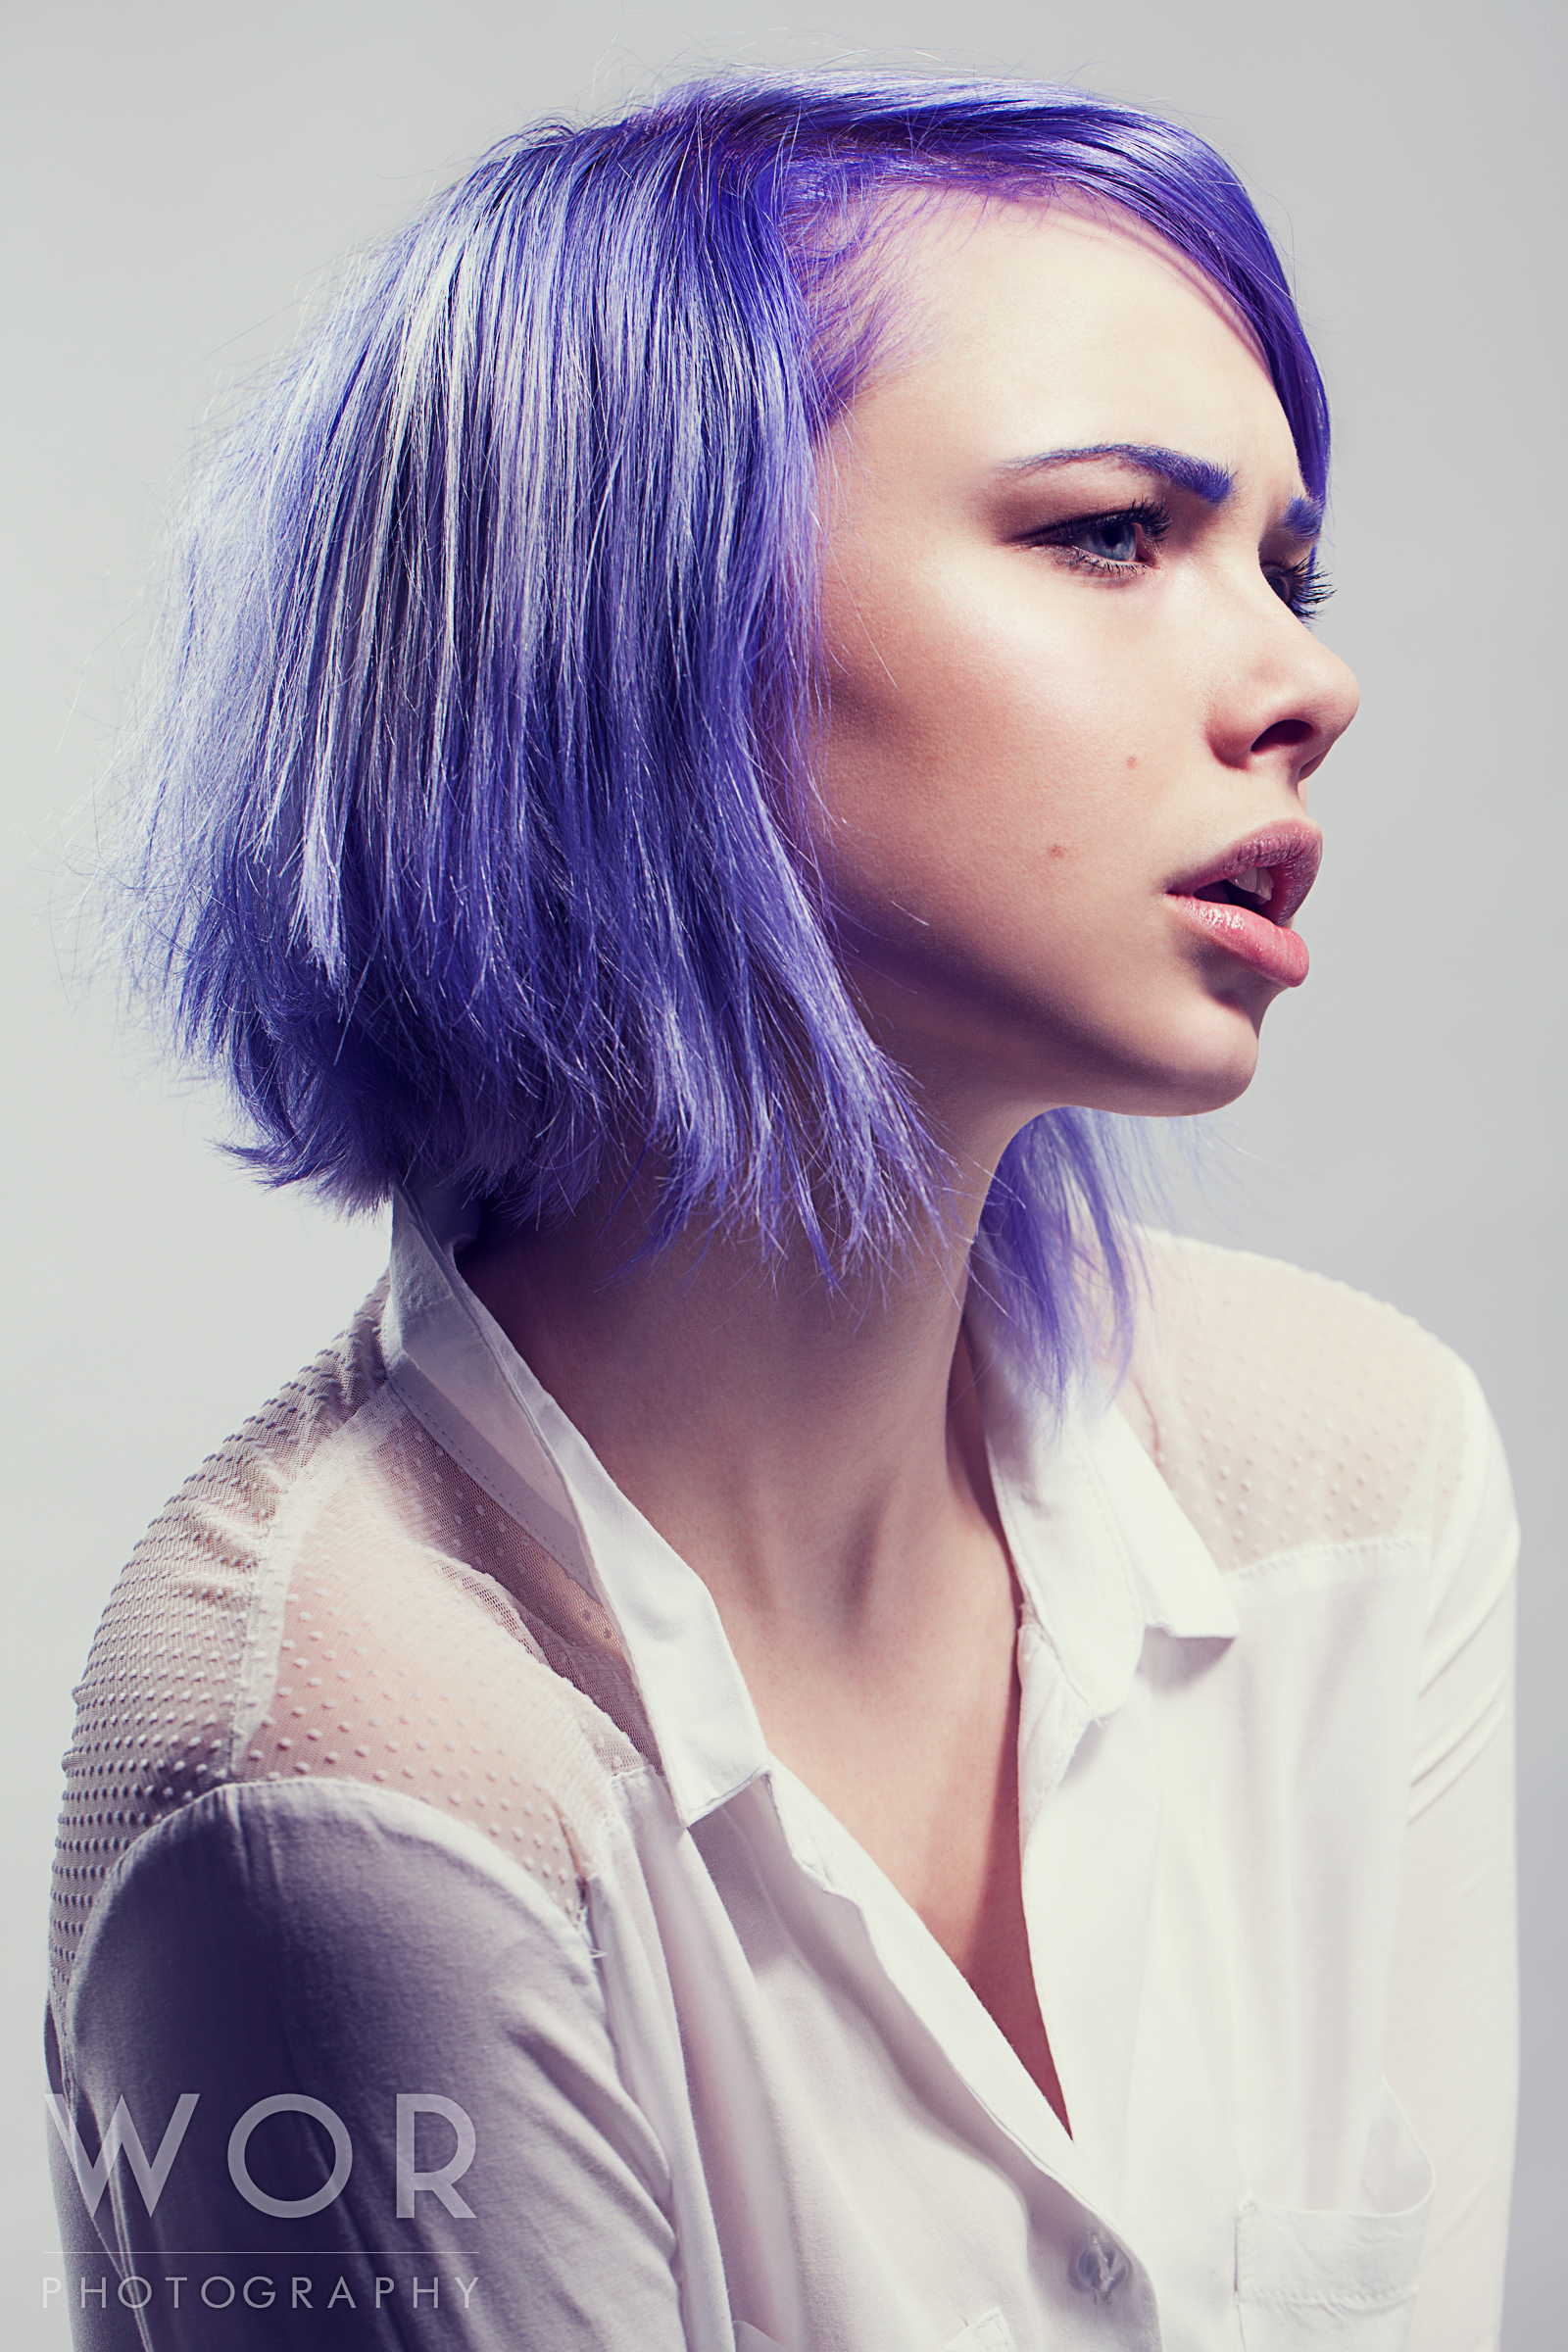 Danielle vd Groef